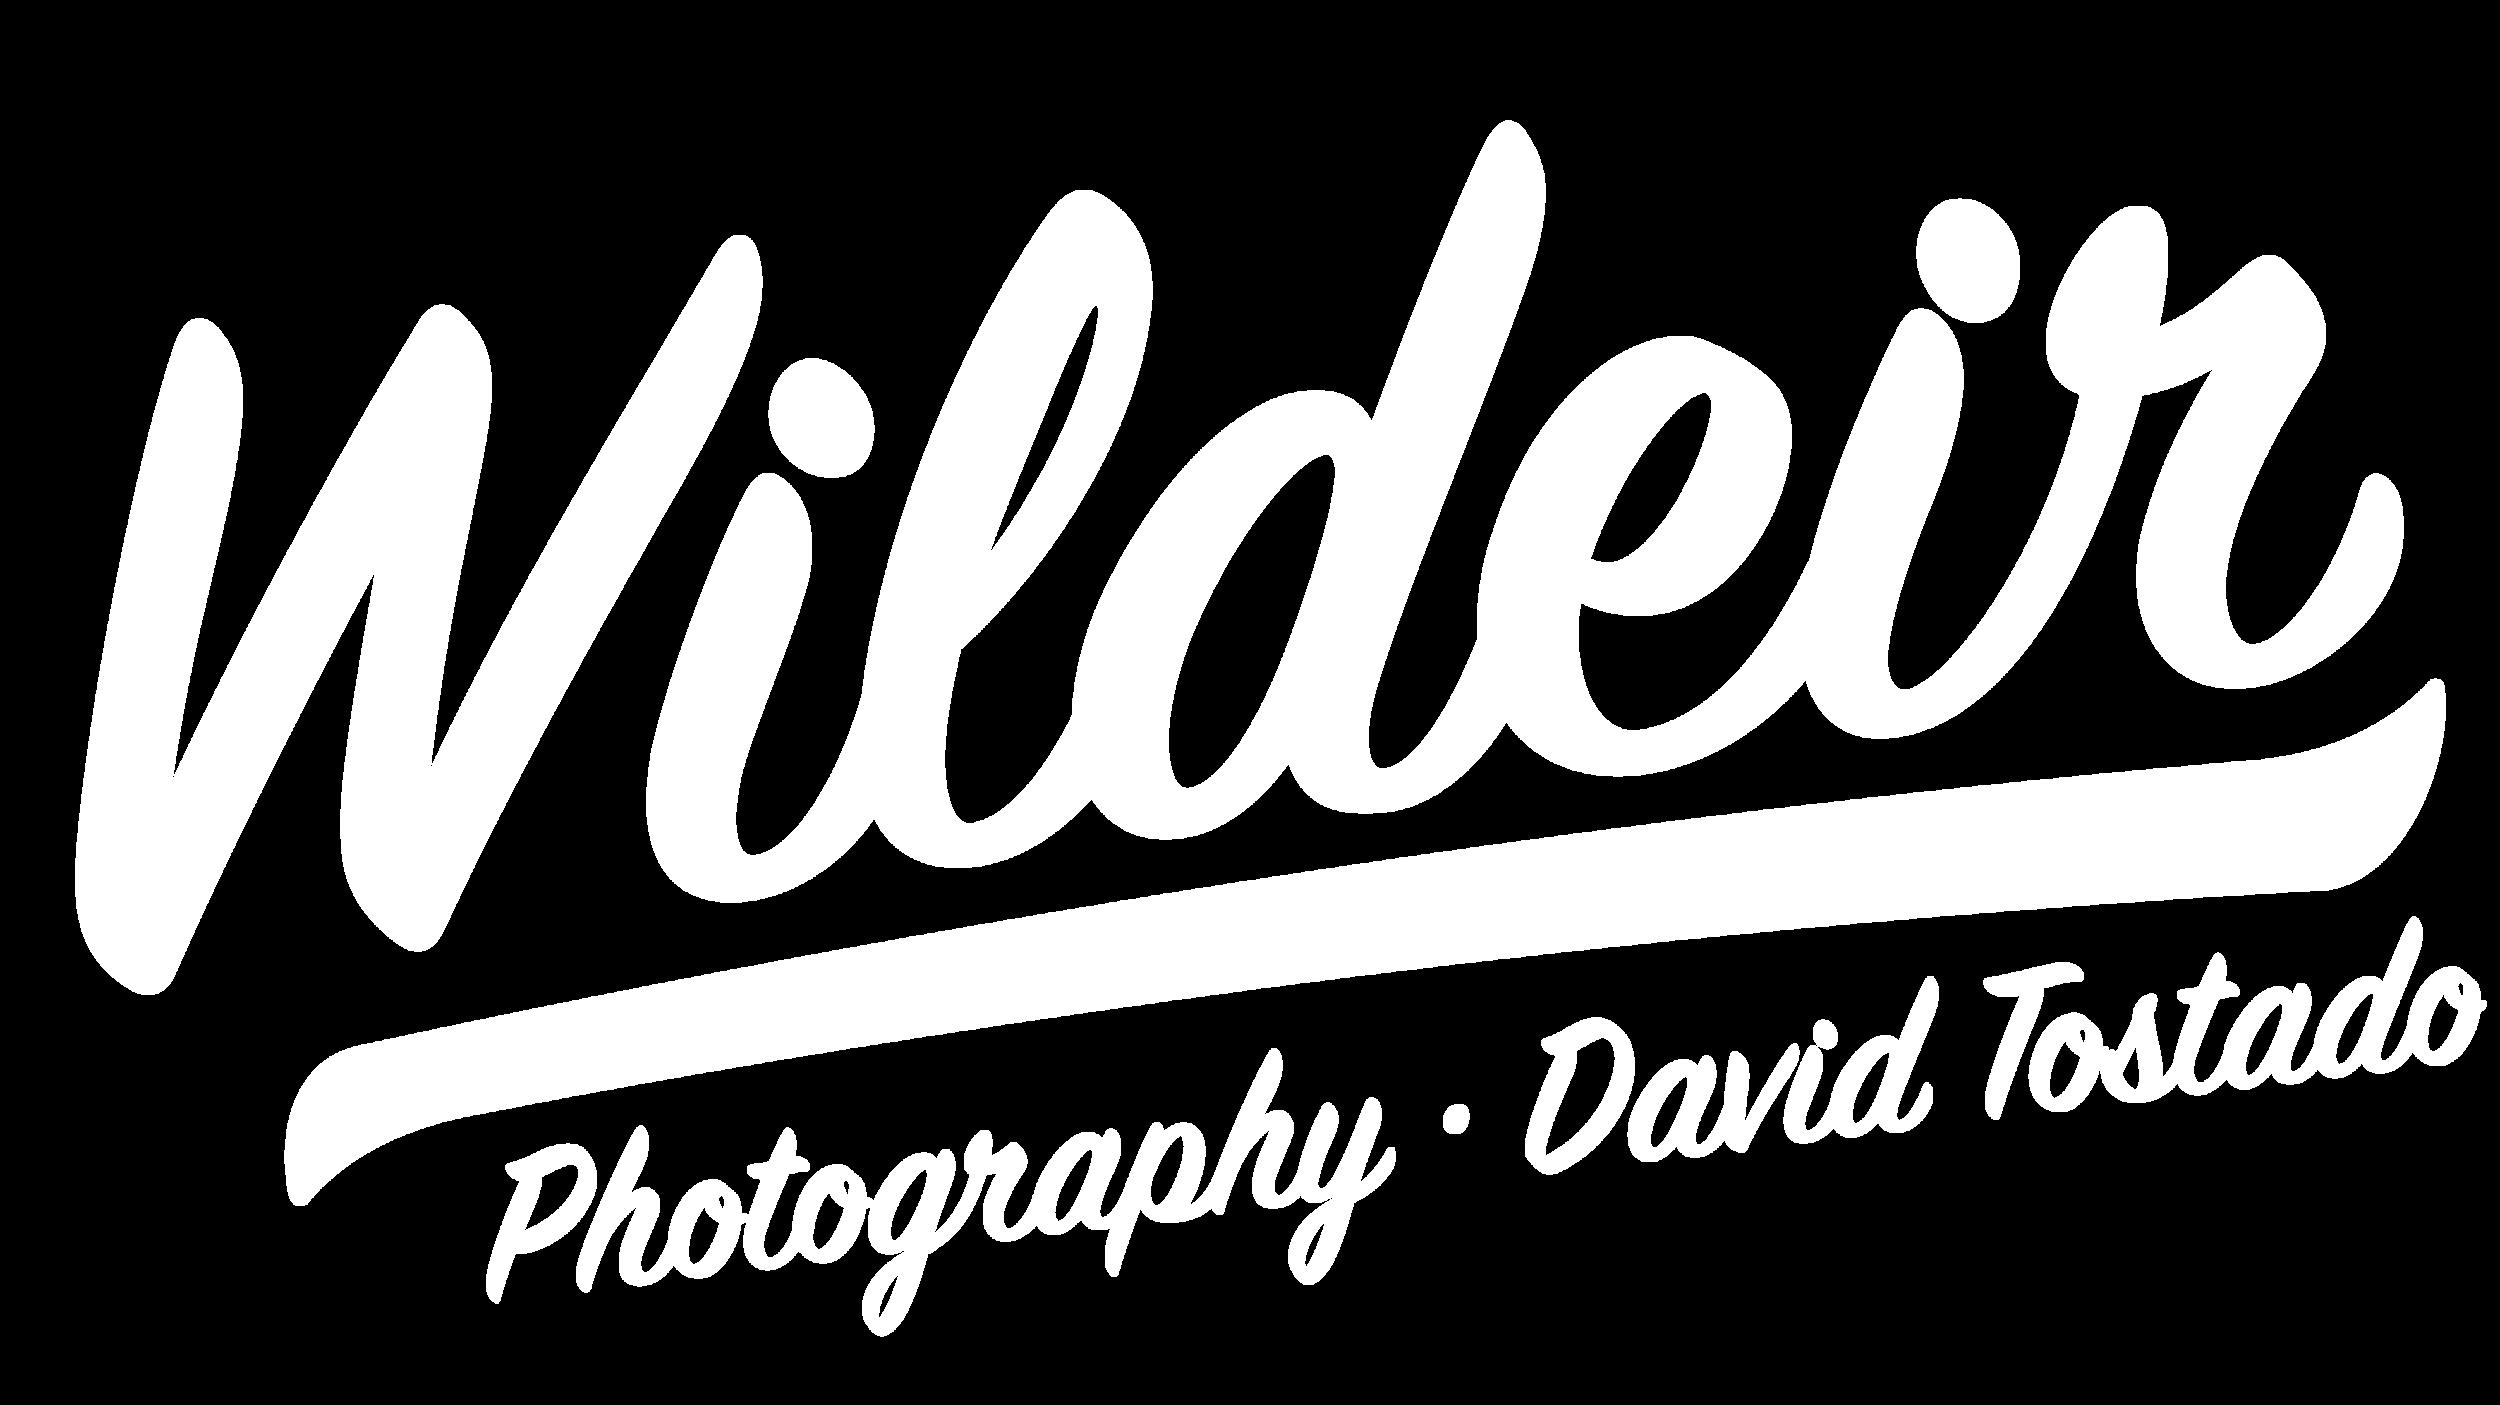 Davids-Logo-2.png